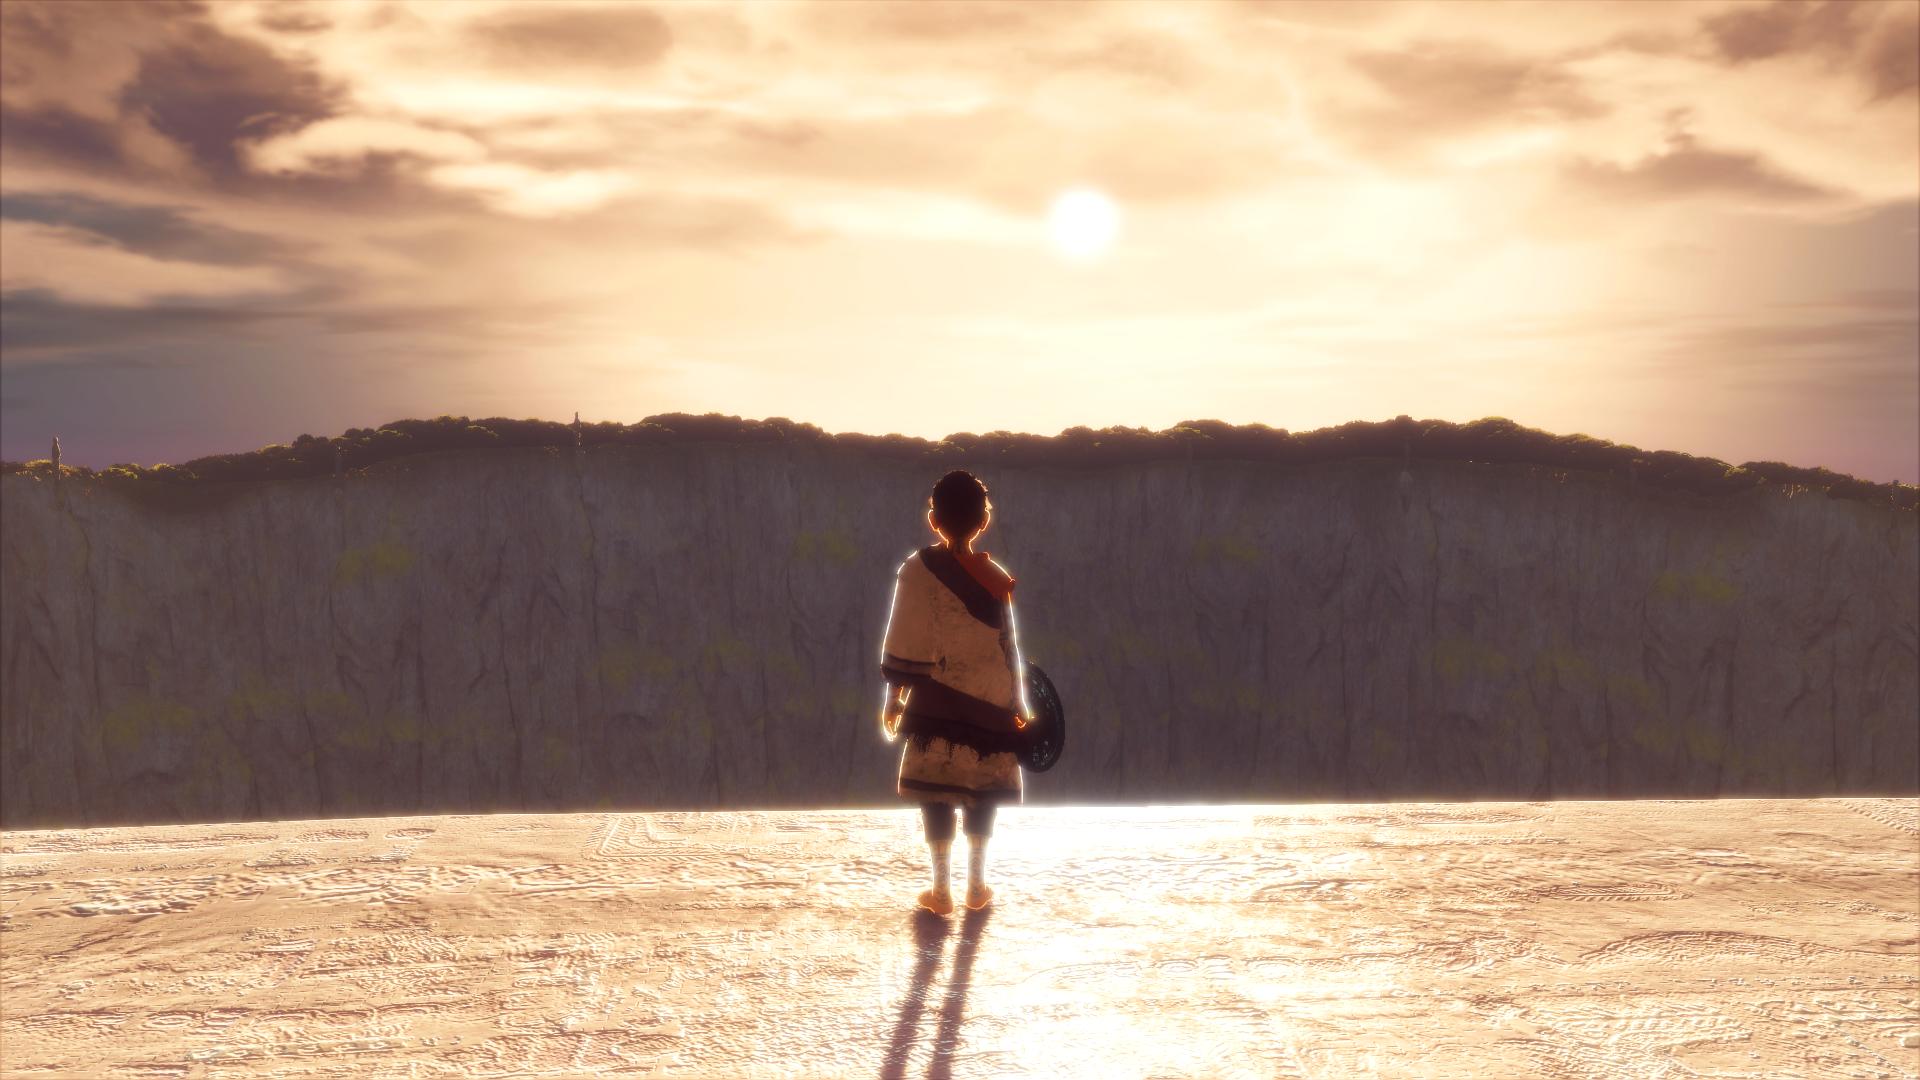 The Last Guardian [Sunset Vista]